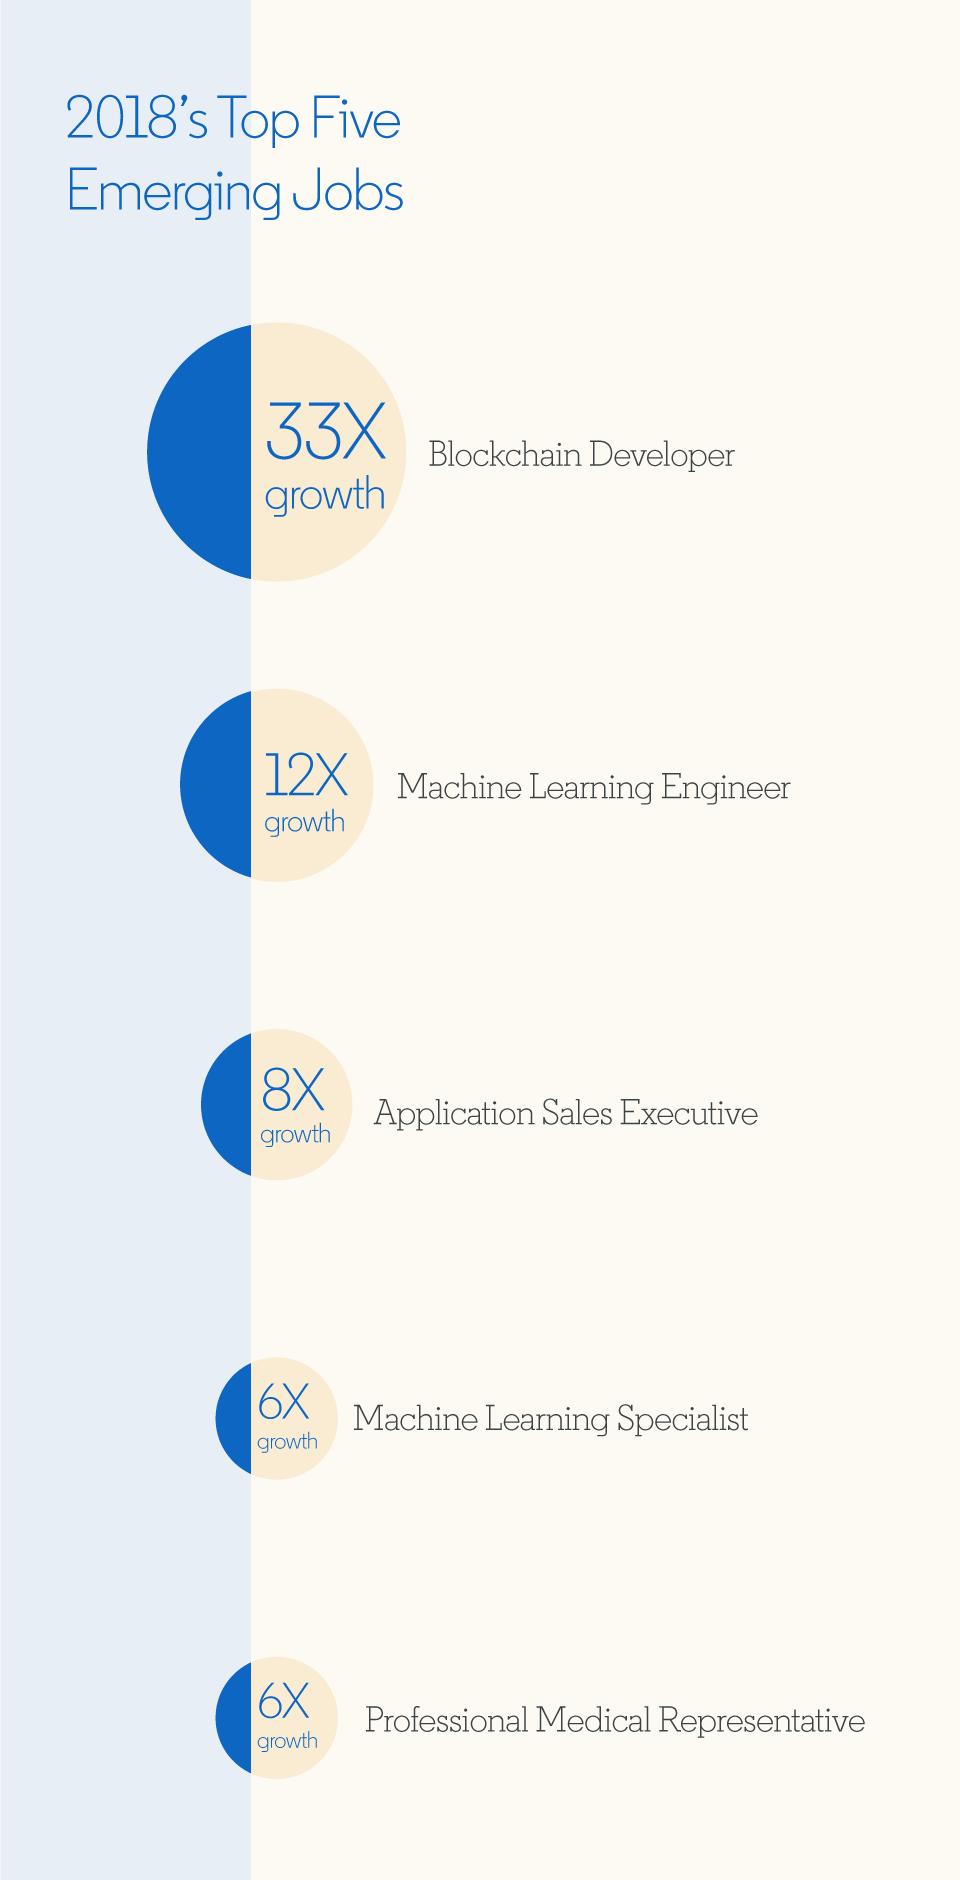 Linkedin: Blockchain Developer is 2018 Most Growing Job Sector (33X) 3